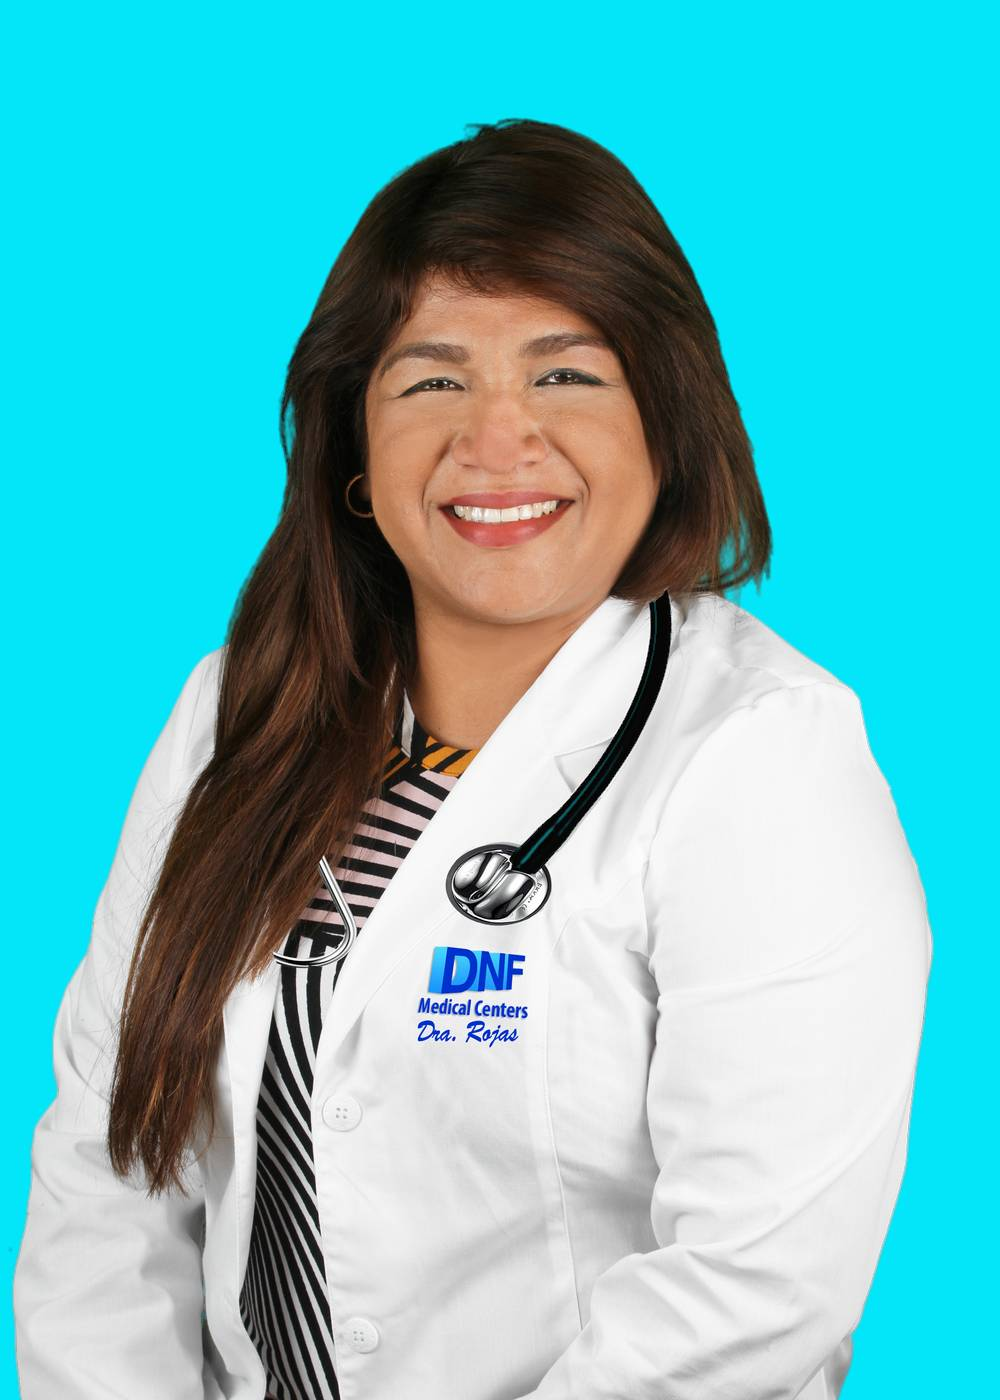 Mabel P. Rojas Vivas, MD